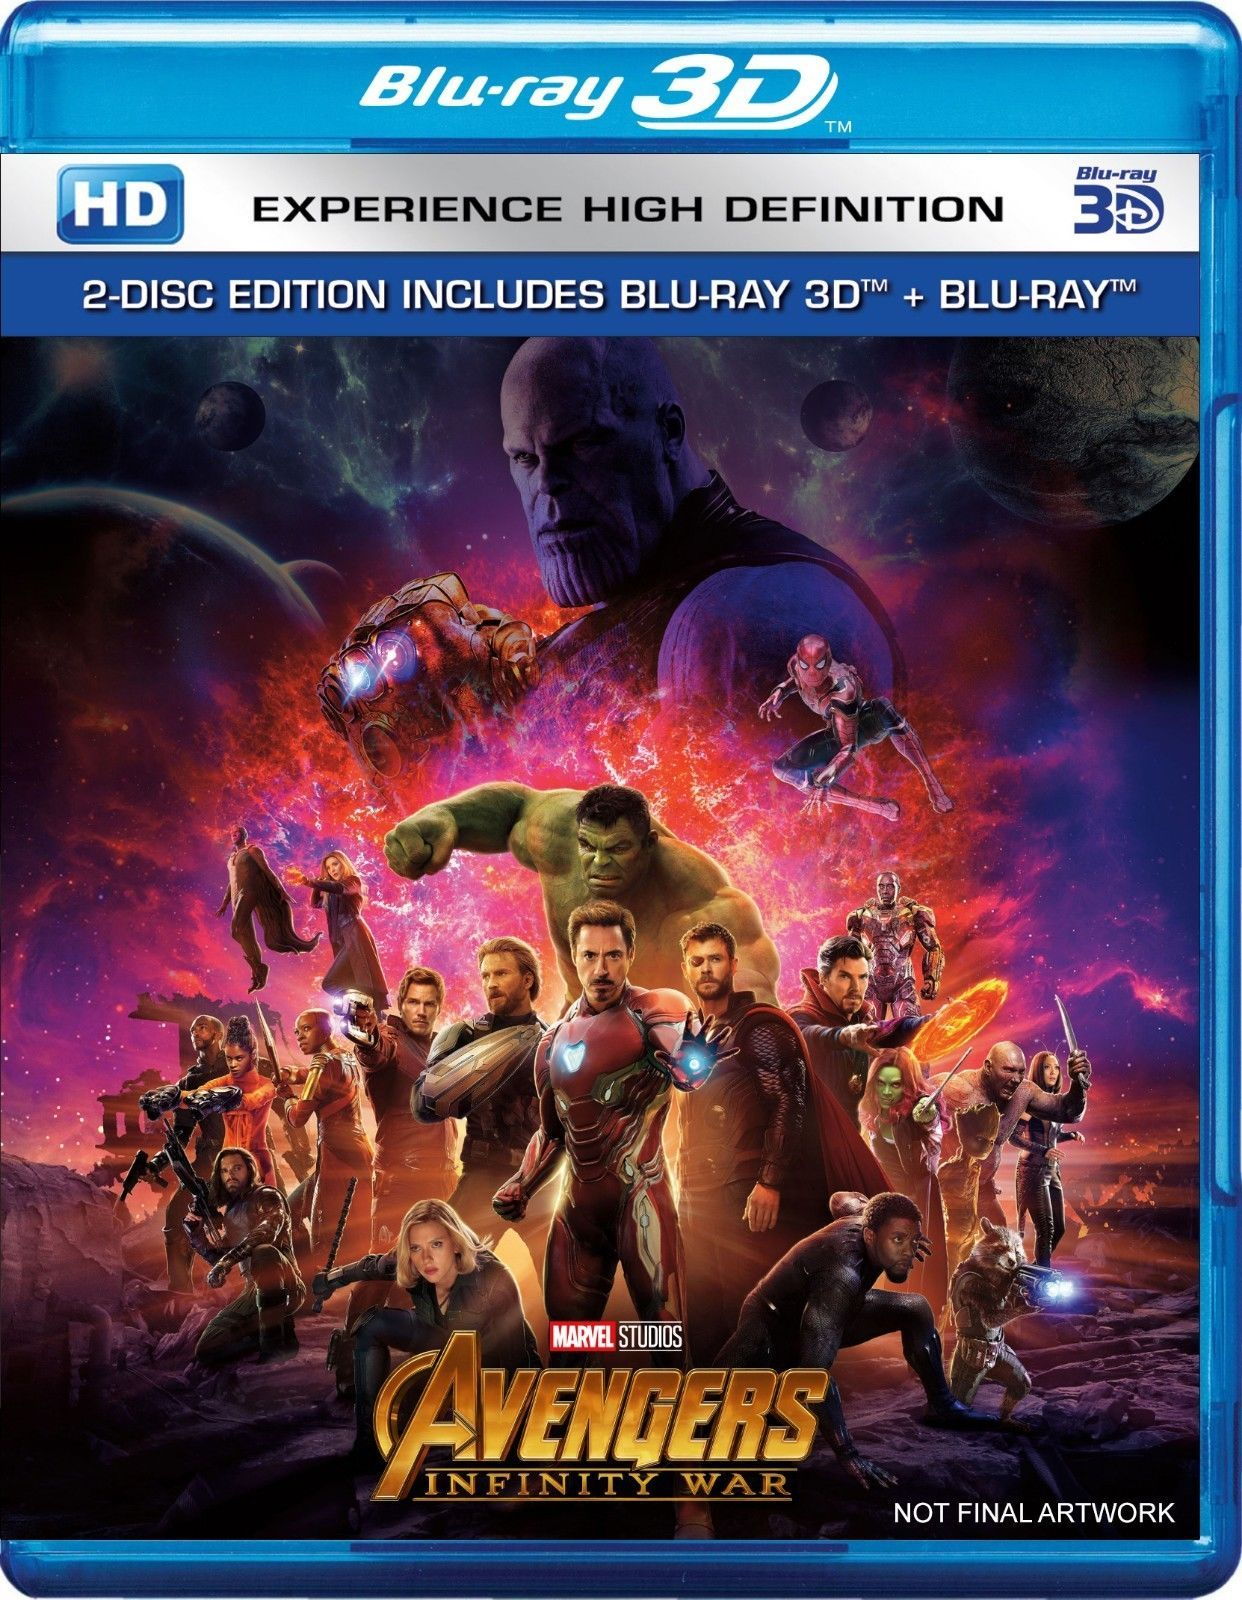 Avengers Infinity War Blu Ray 3d Blu Ray Region Free 2018 New 마블 영화 포스터 빈티지 영화 포스터